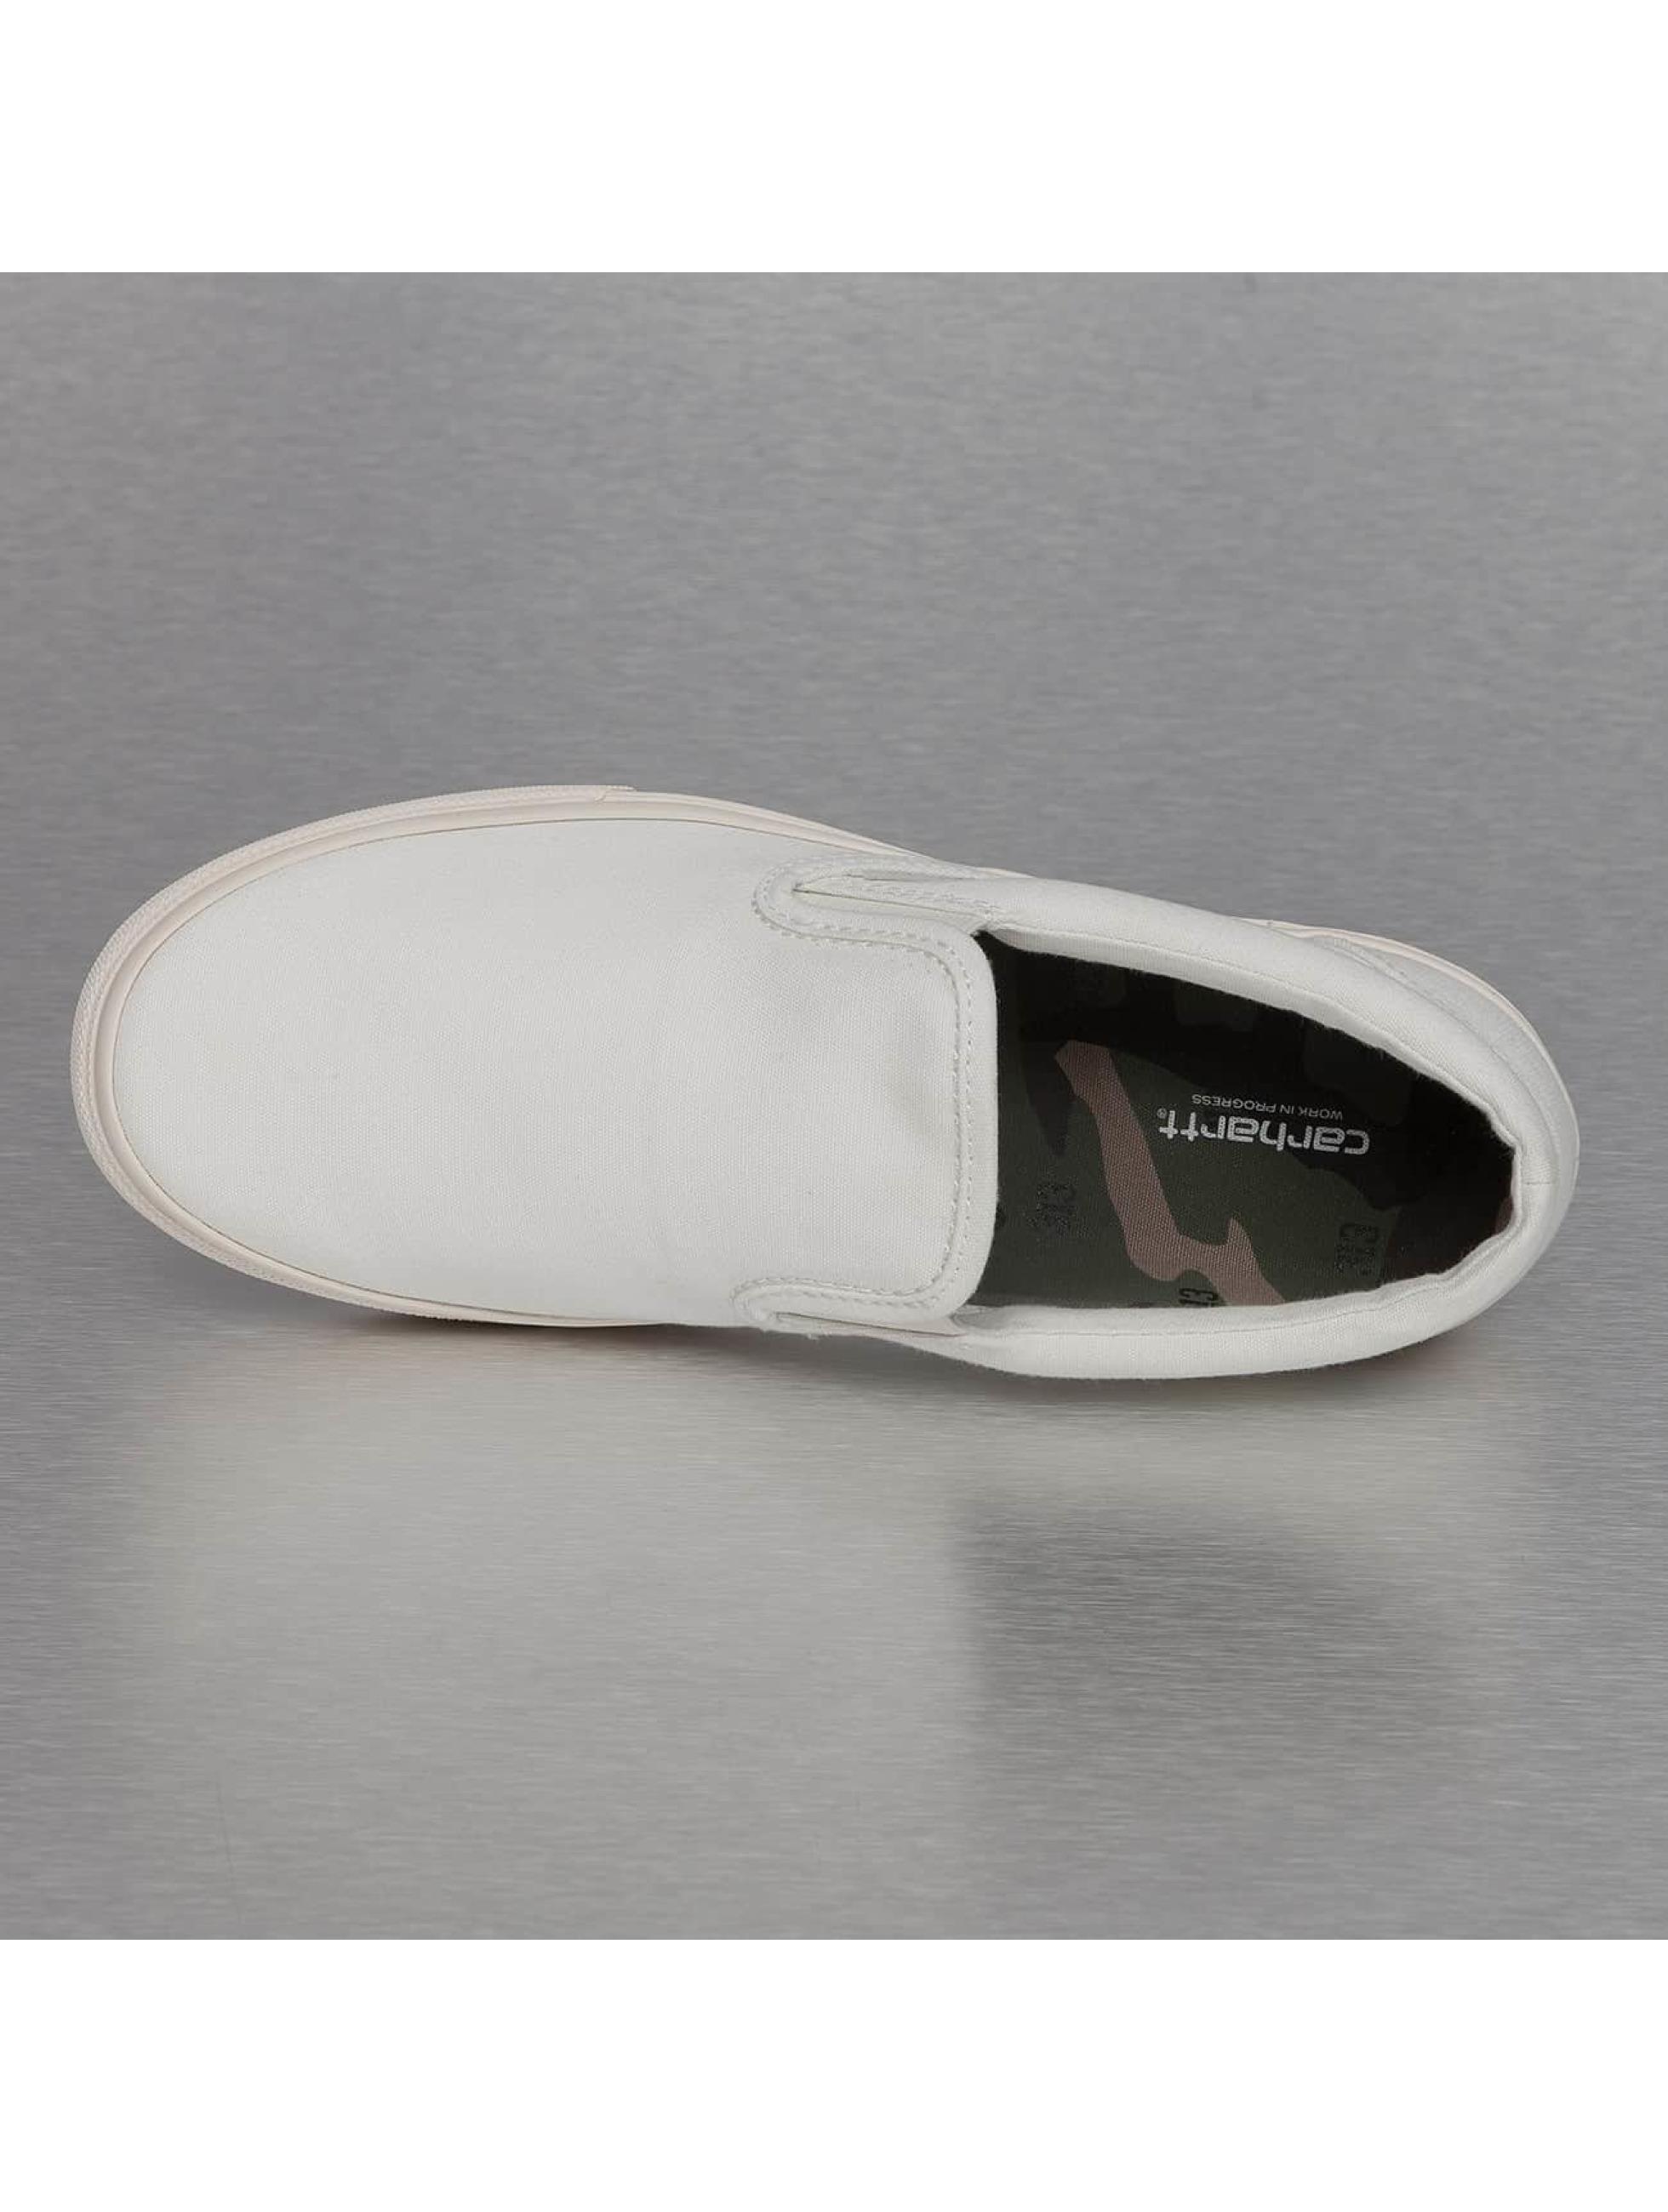 Carhartt WIP Sneaker Chicago beige